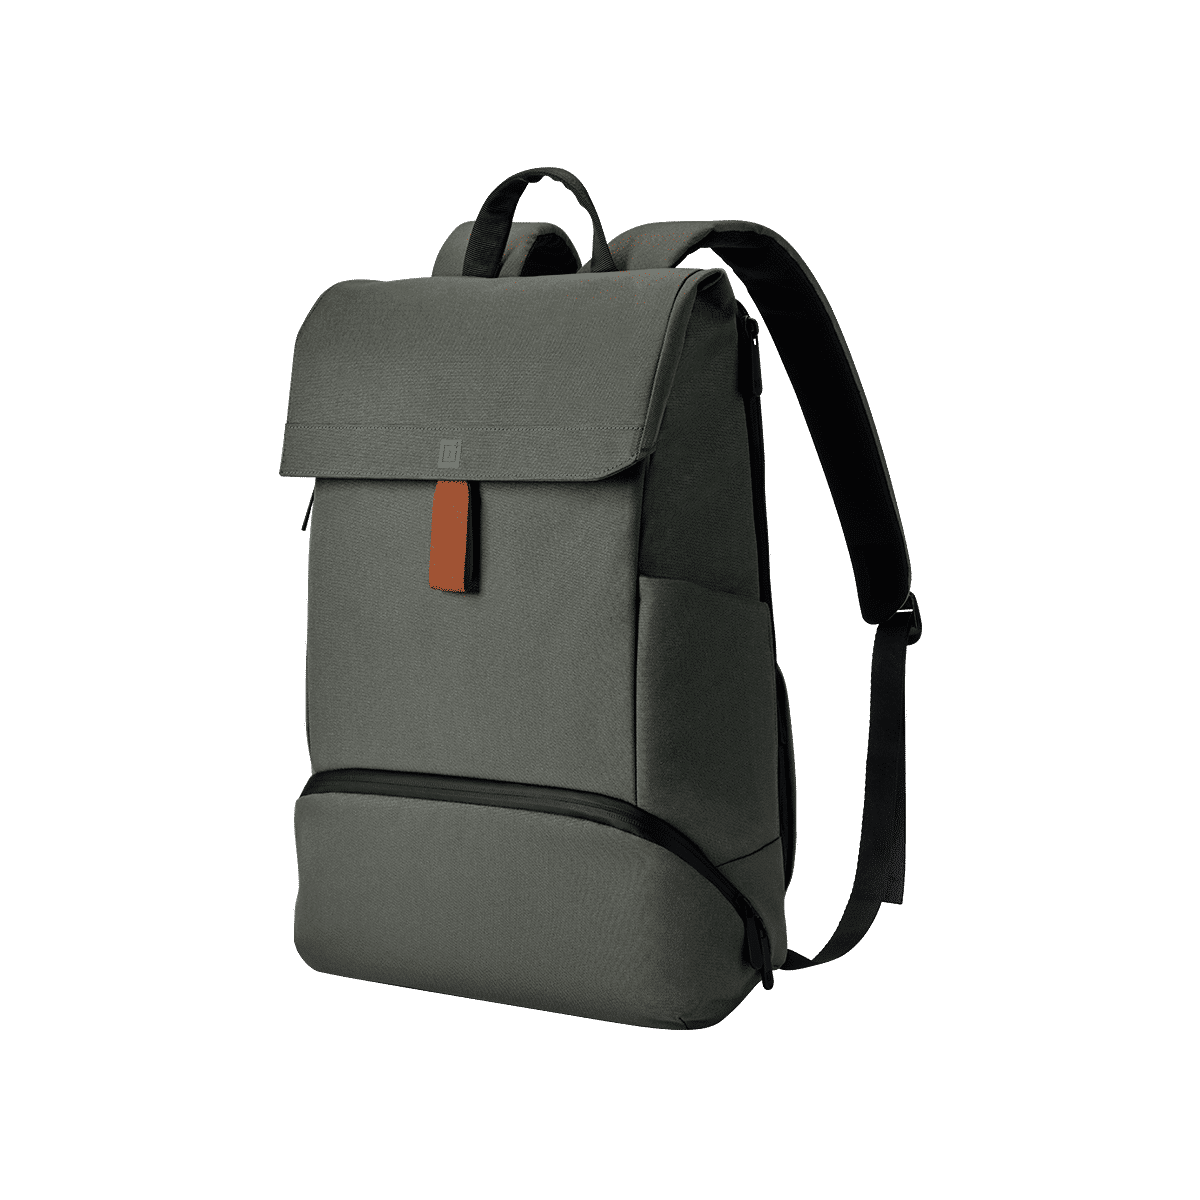 OnePlus Explorer Backpack Morandi Green